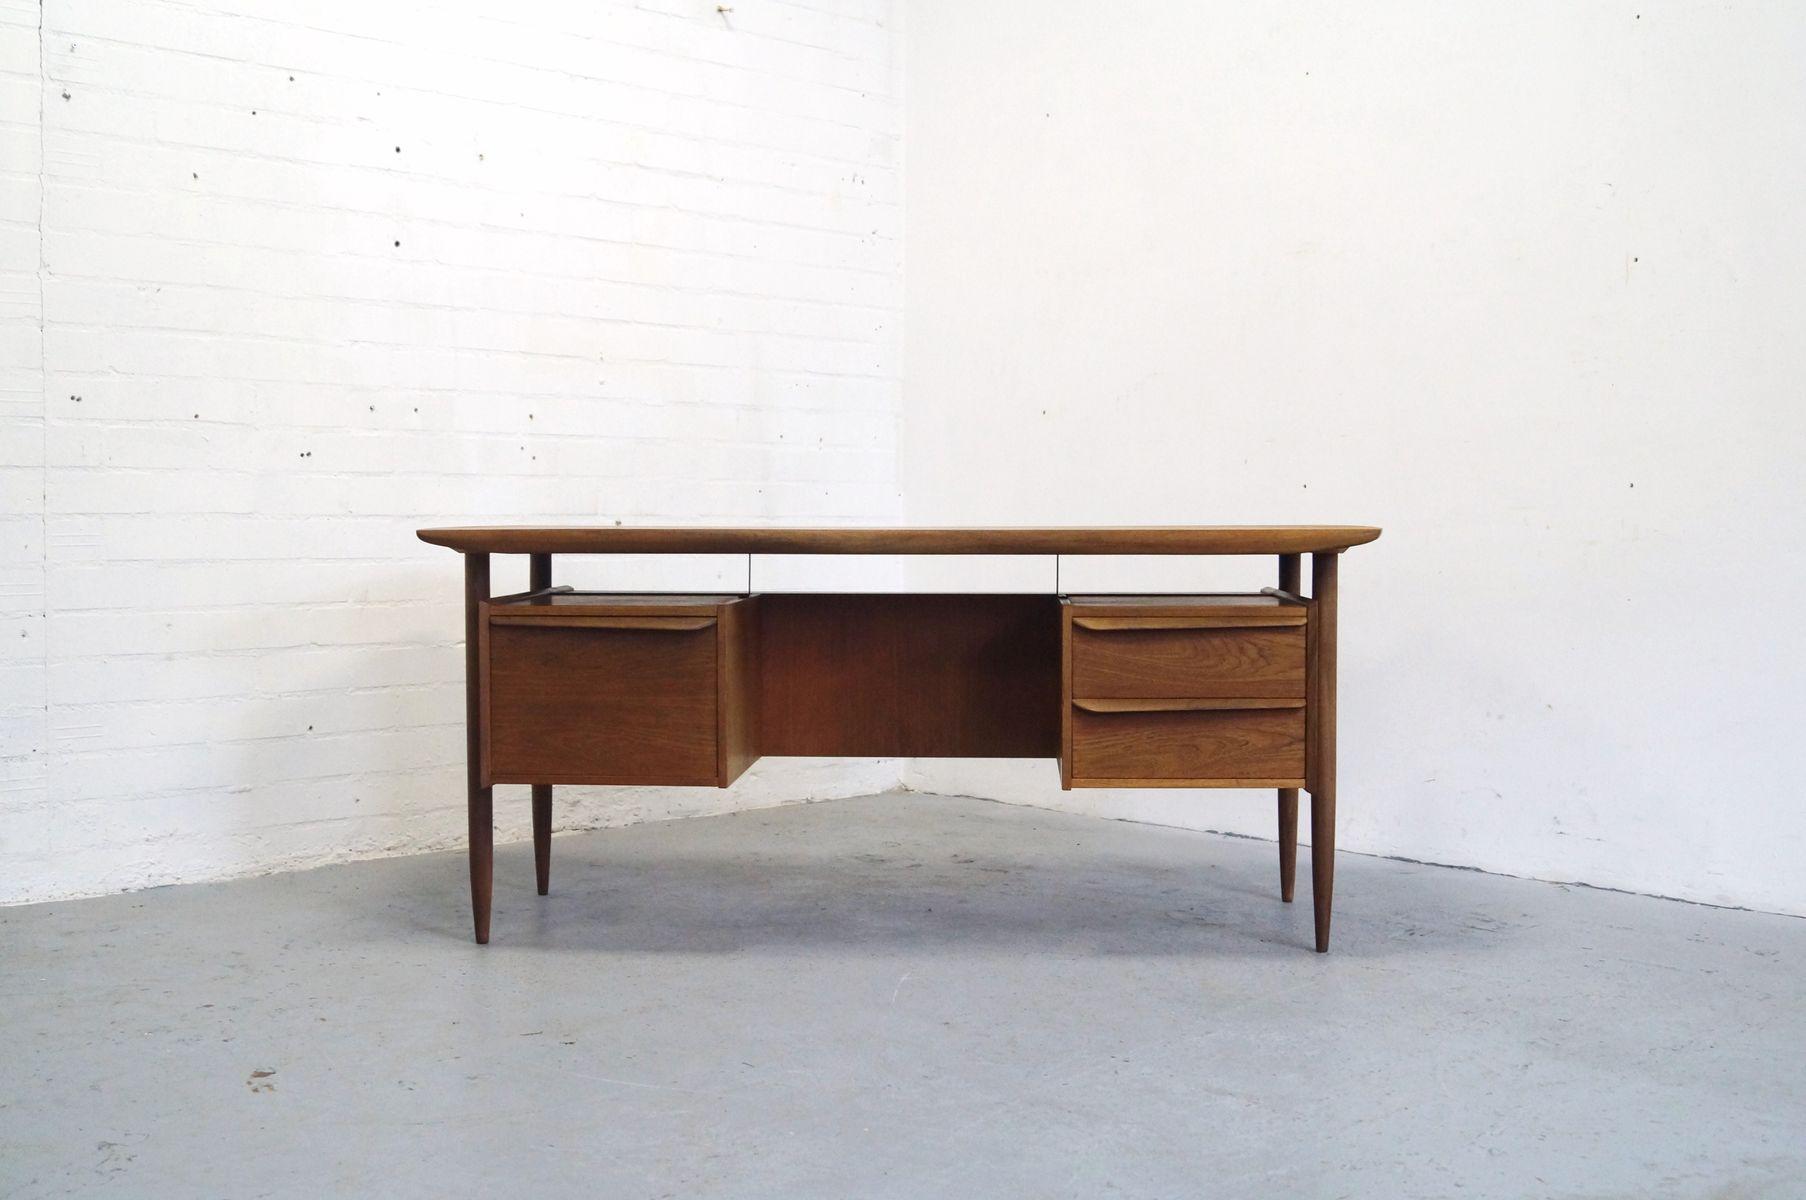 Vintage teak bureau by tijsseling 1950s for sale at pamono for Bureau for sale